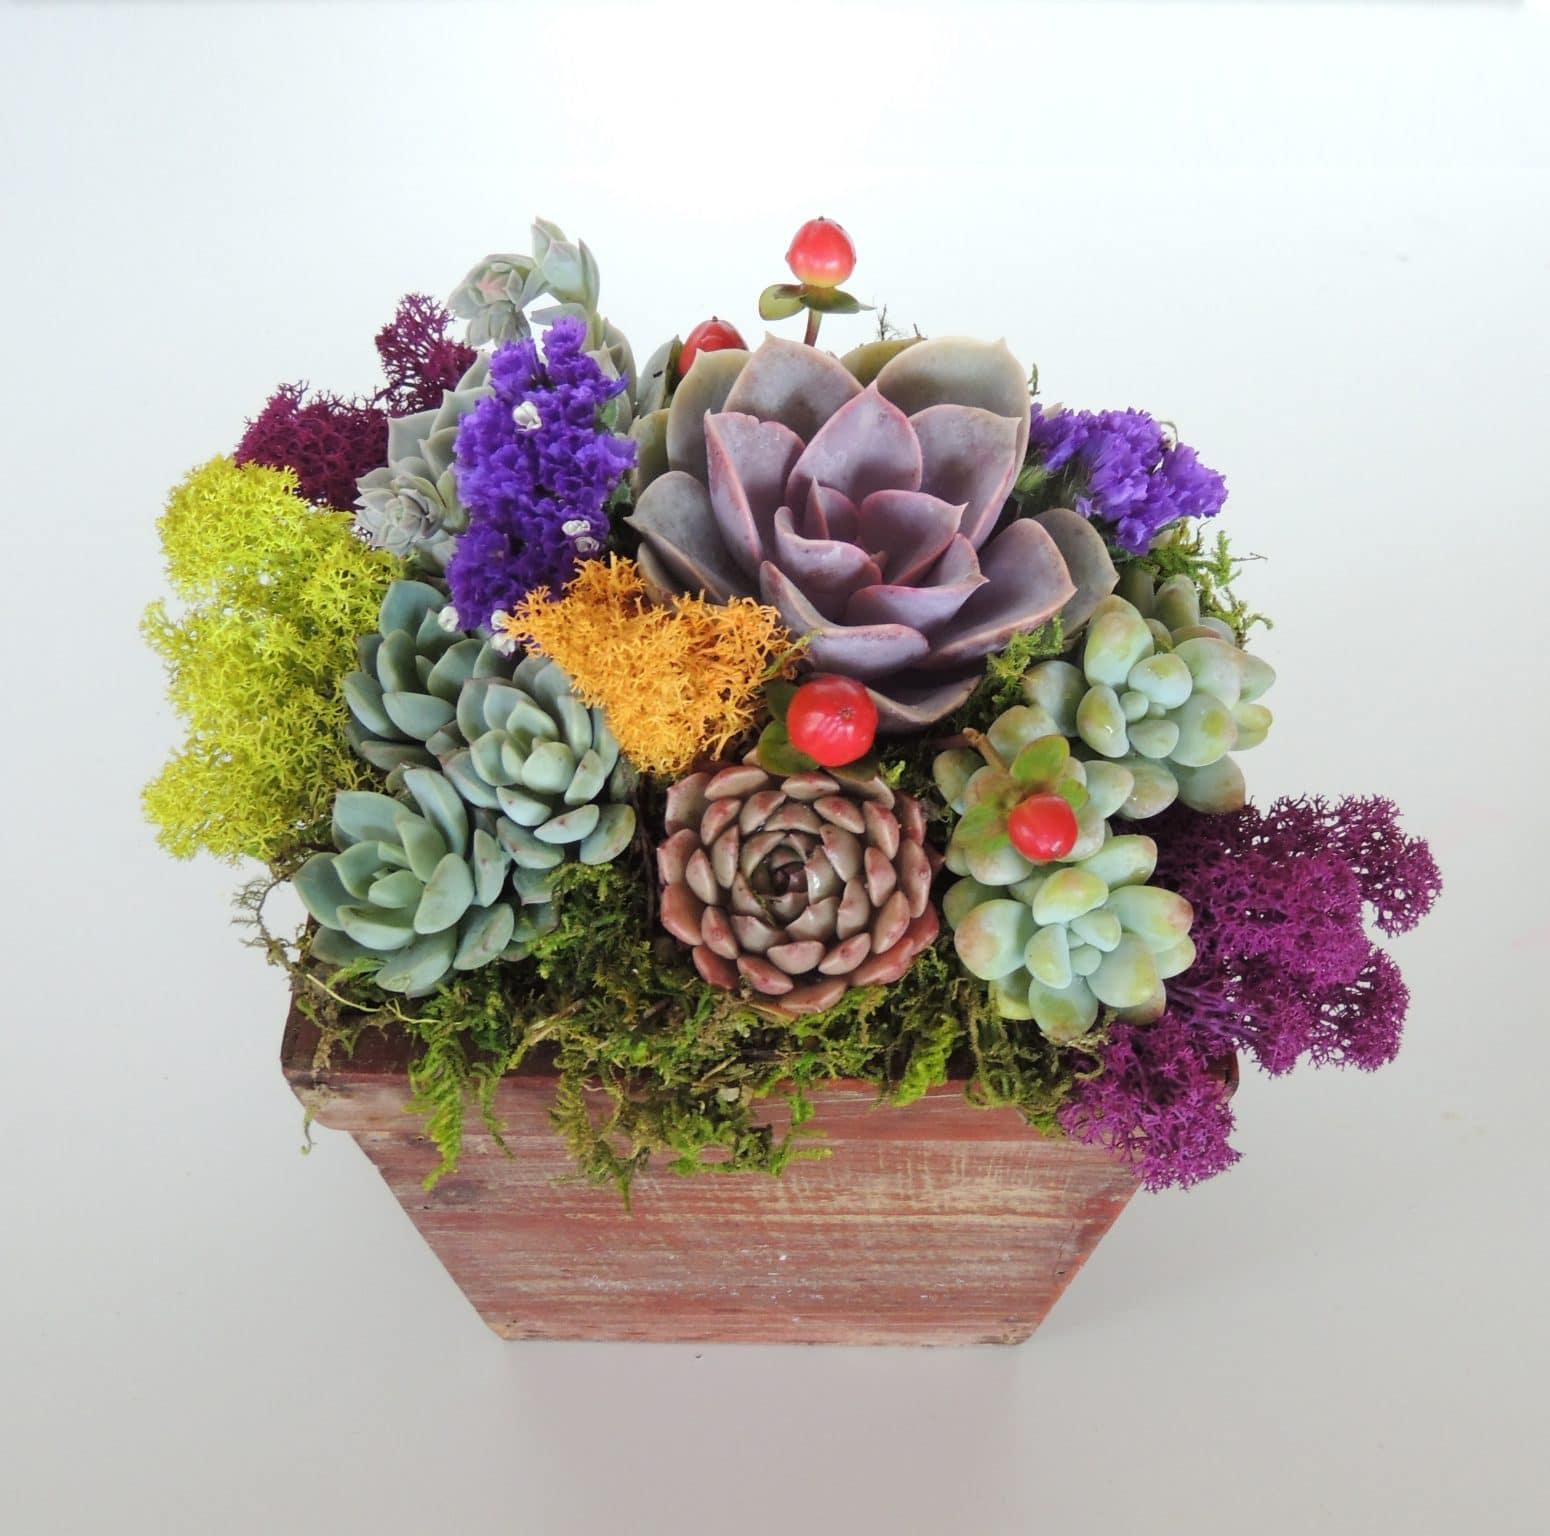 Succulent arrangements 6 x 6 urban succulents for Indoor plant gift ideas